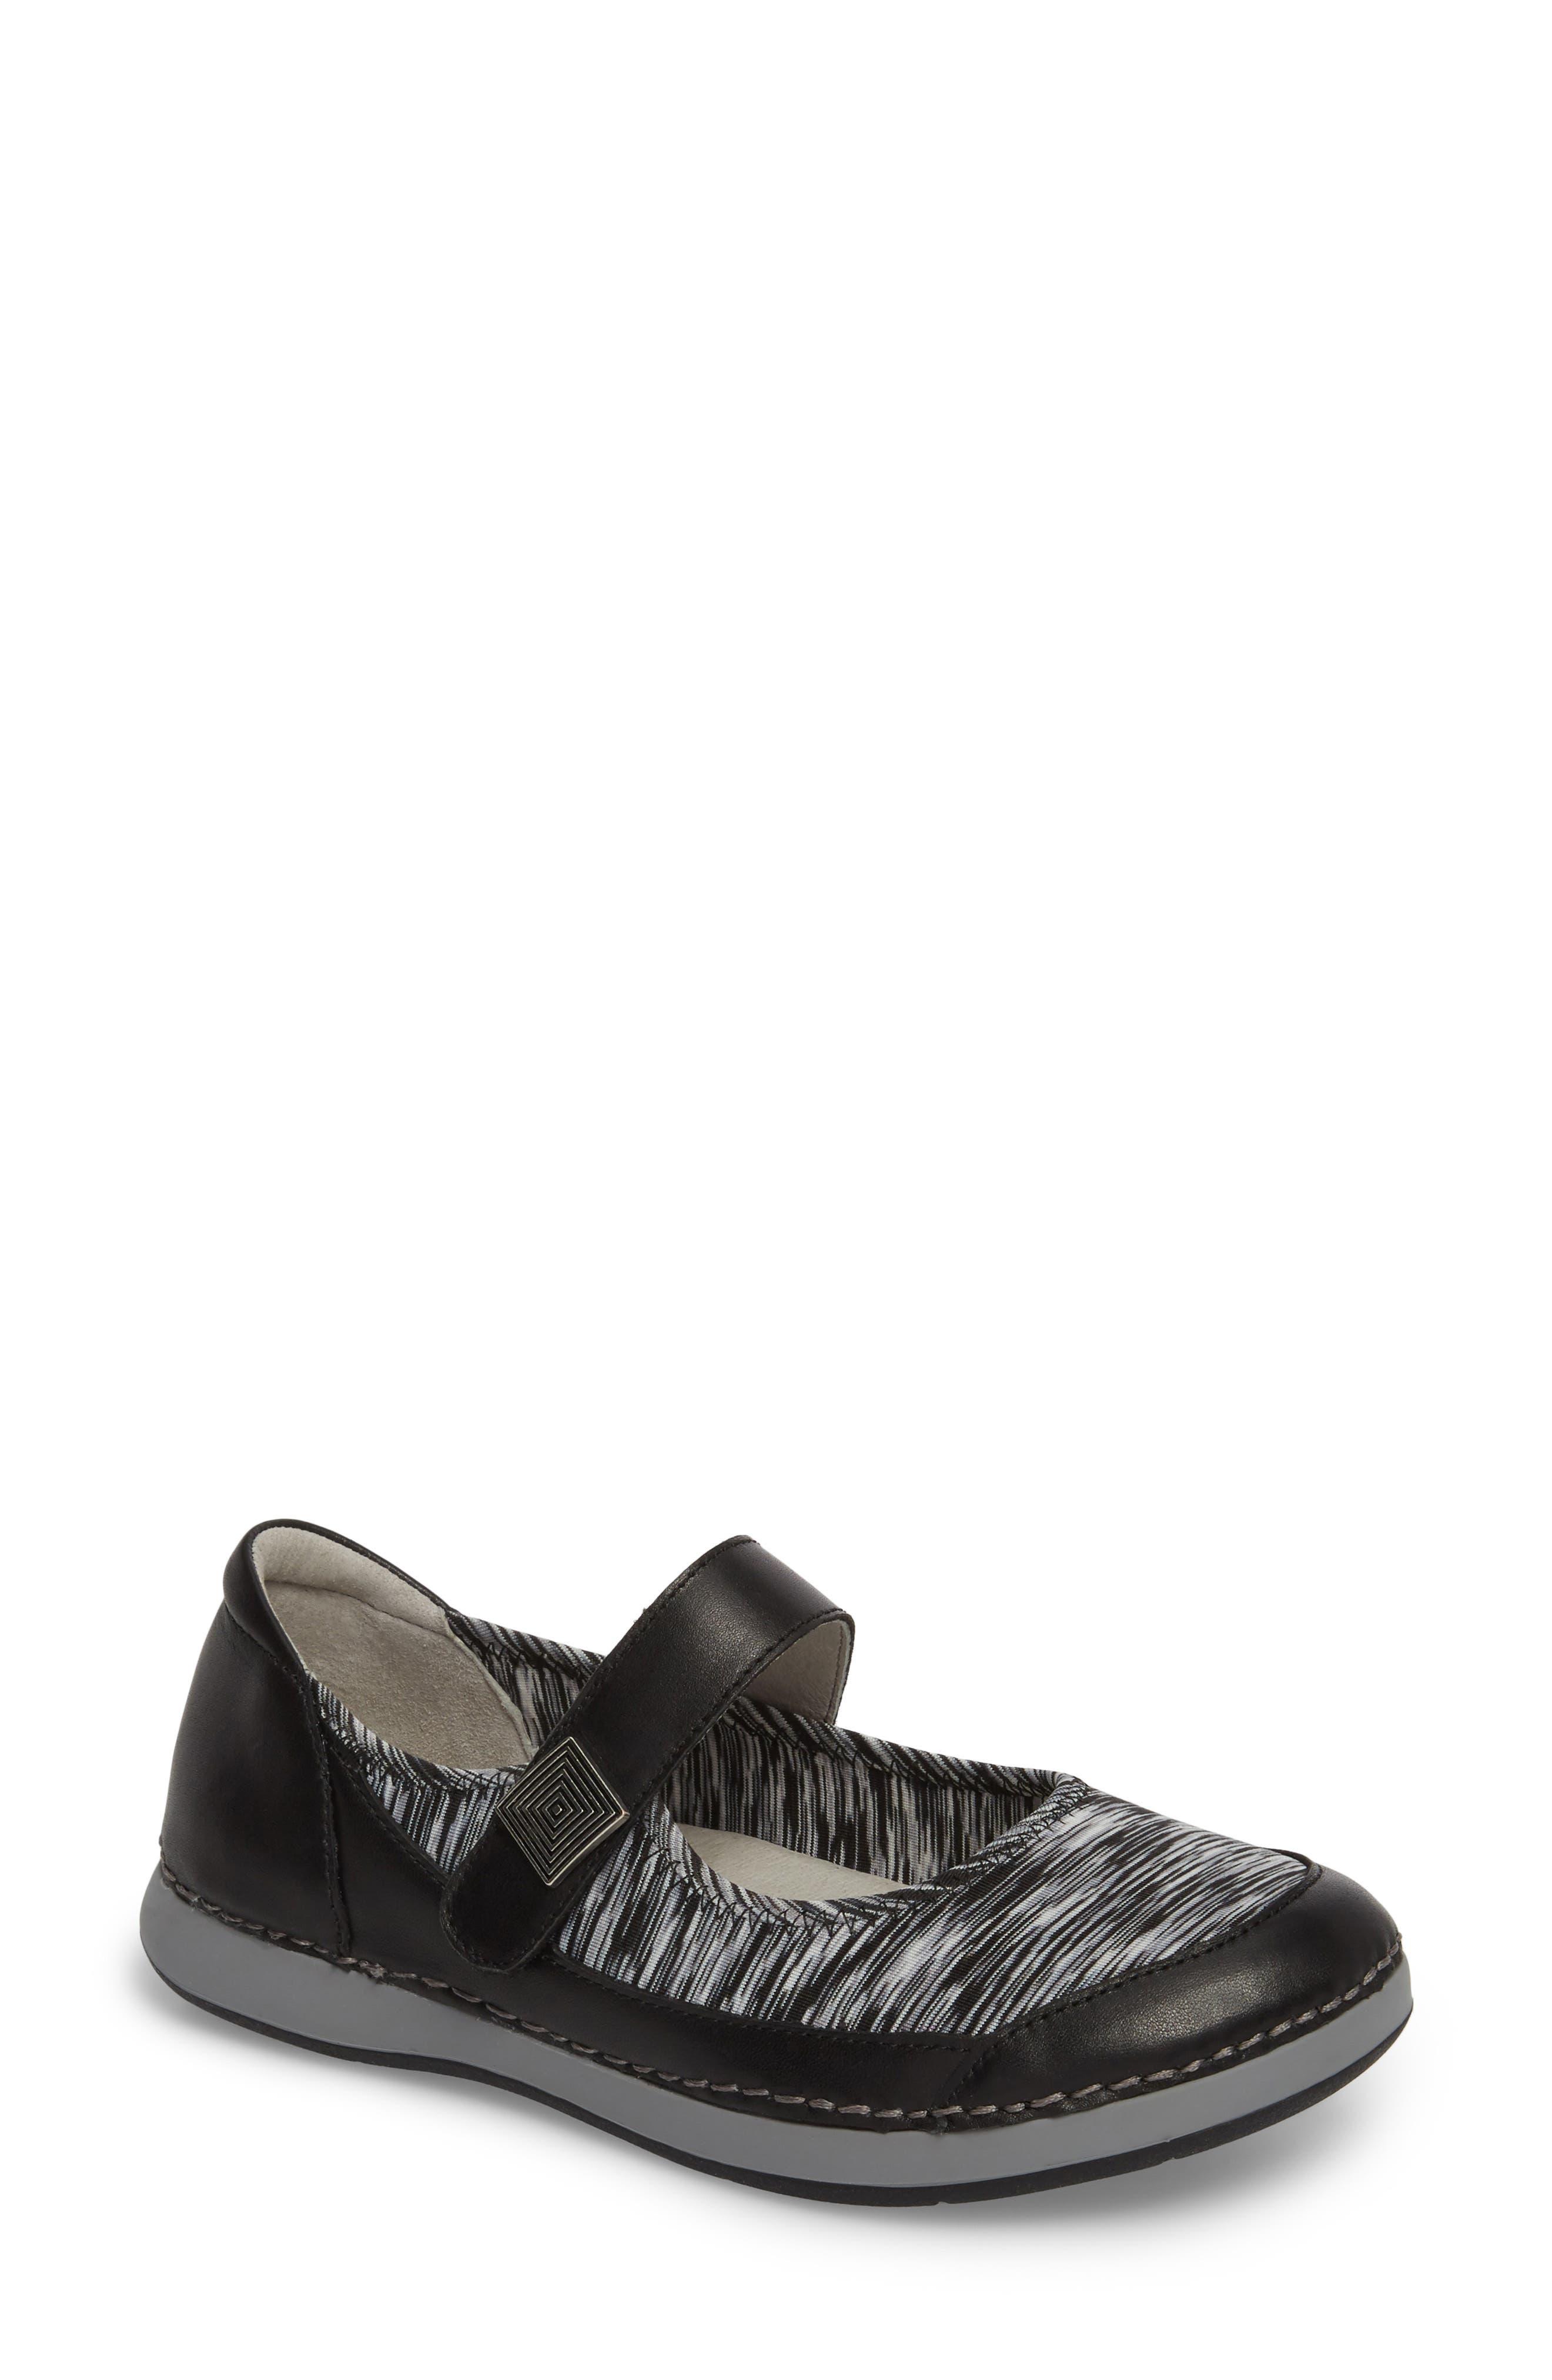 Gem Mary Jane Flat,                         Main,                         color, Black Leather